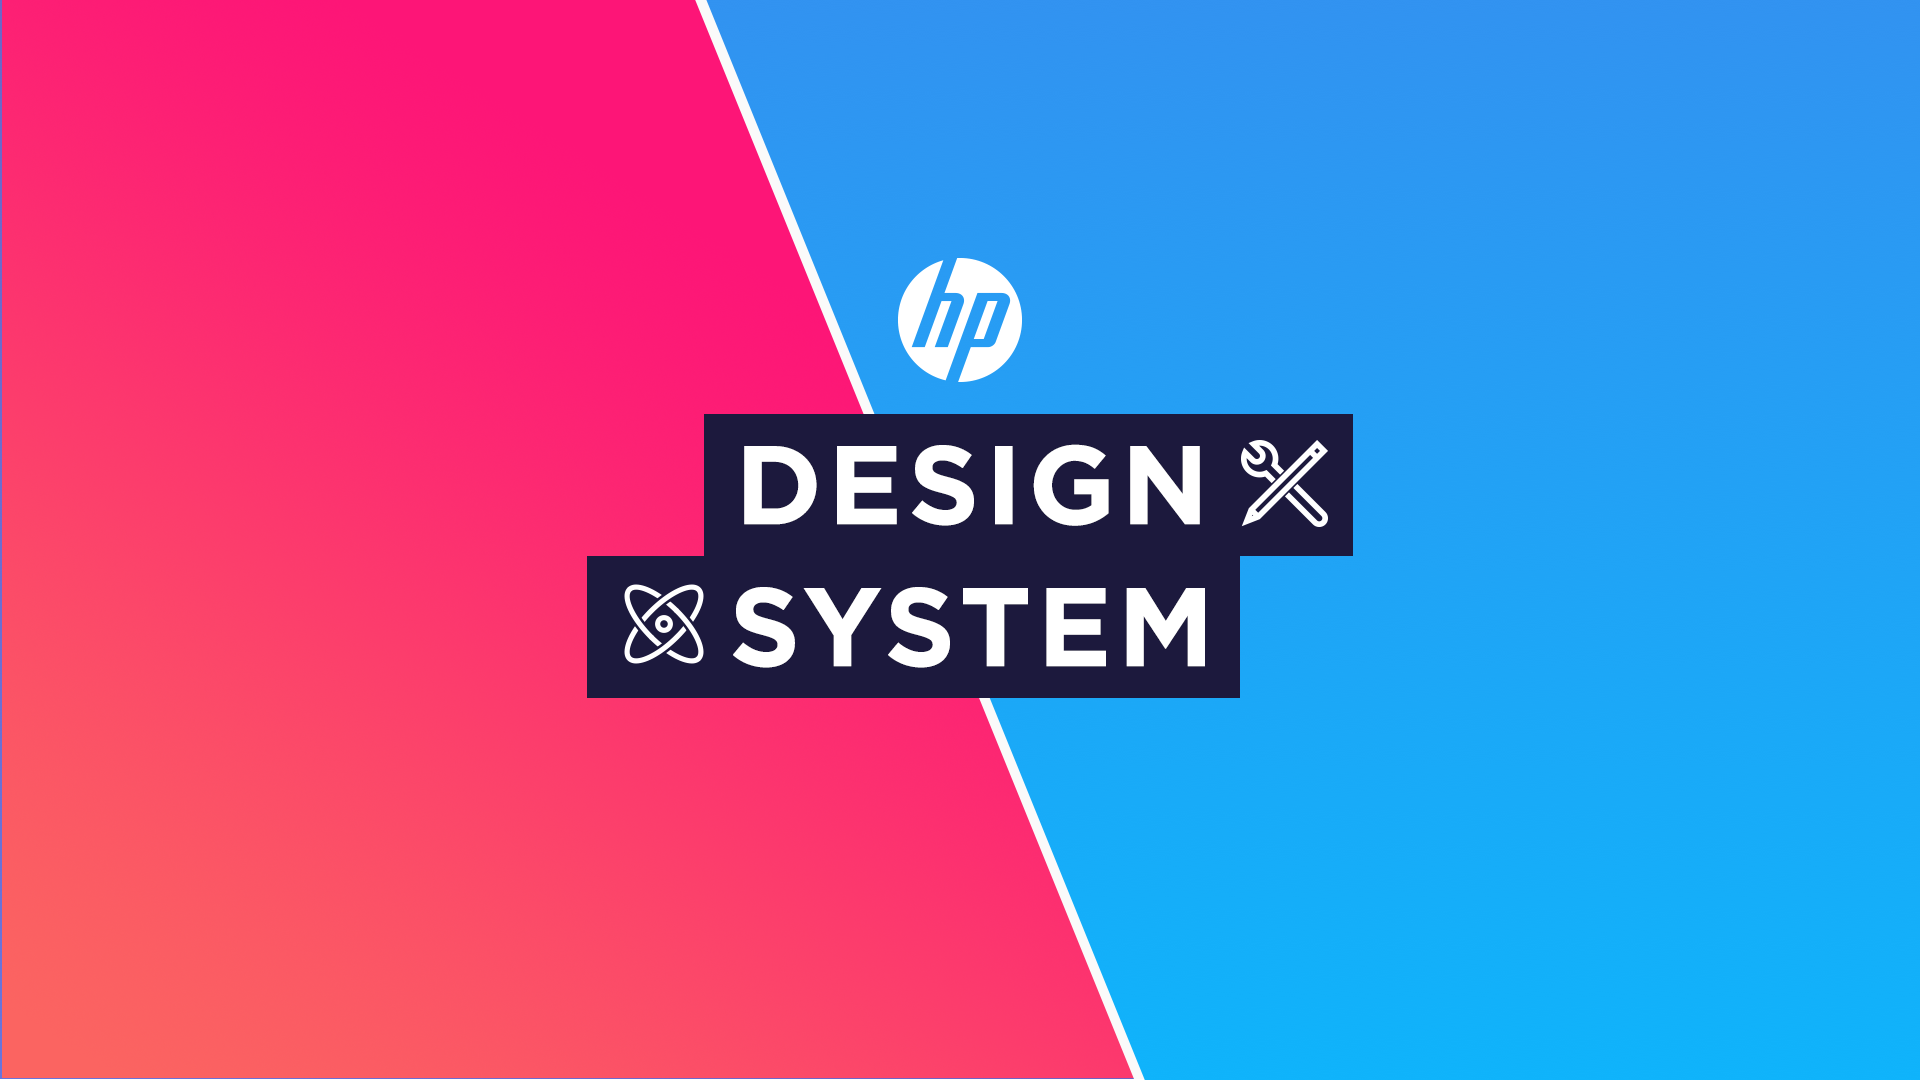 HP Design System